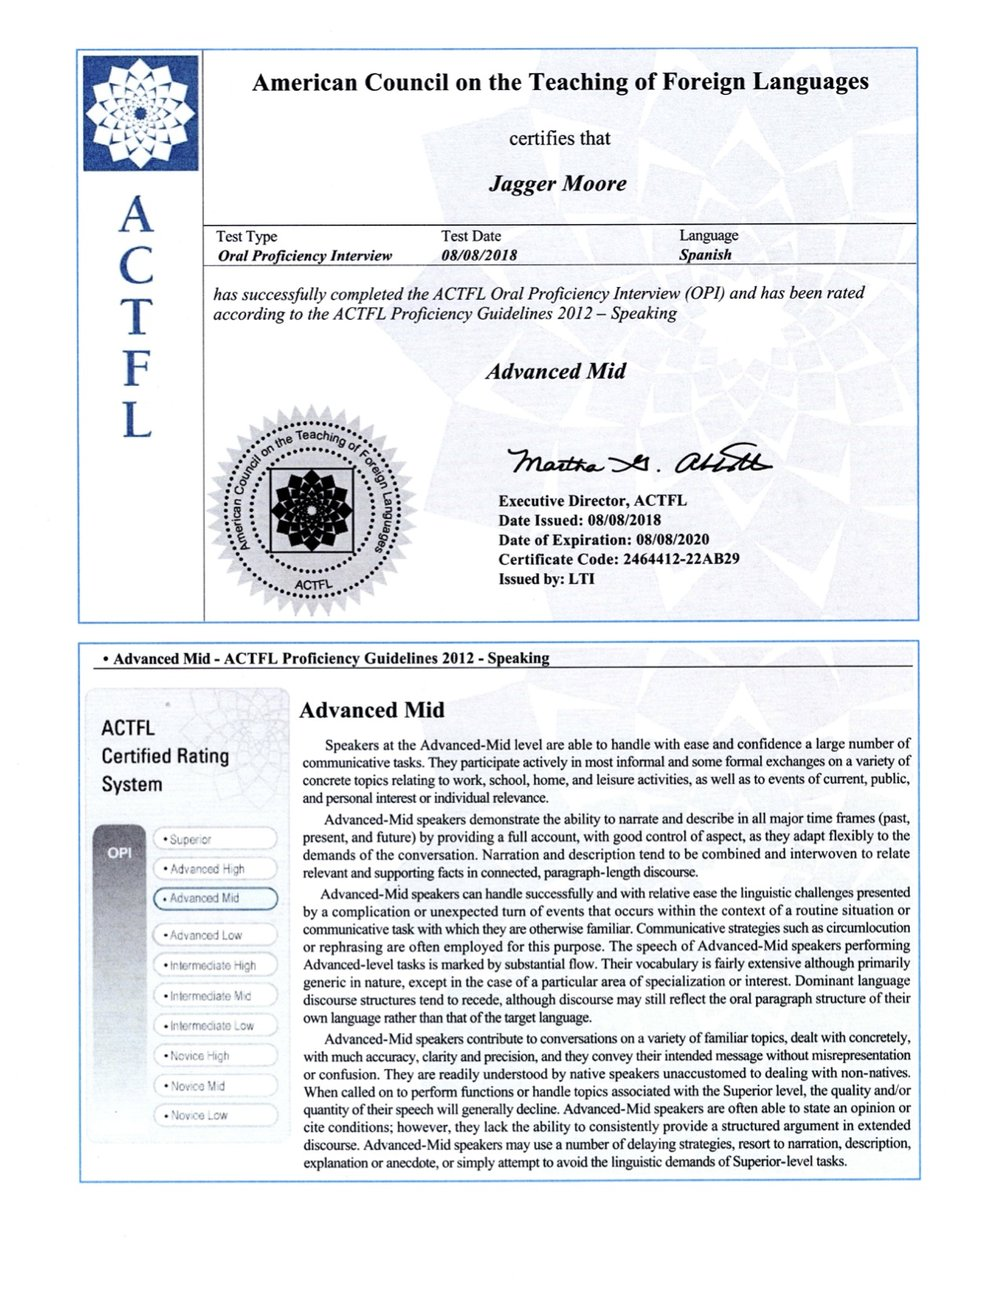 Spanish Certificate.jpg